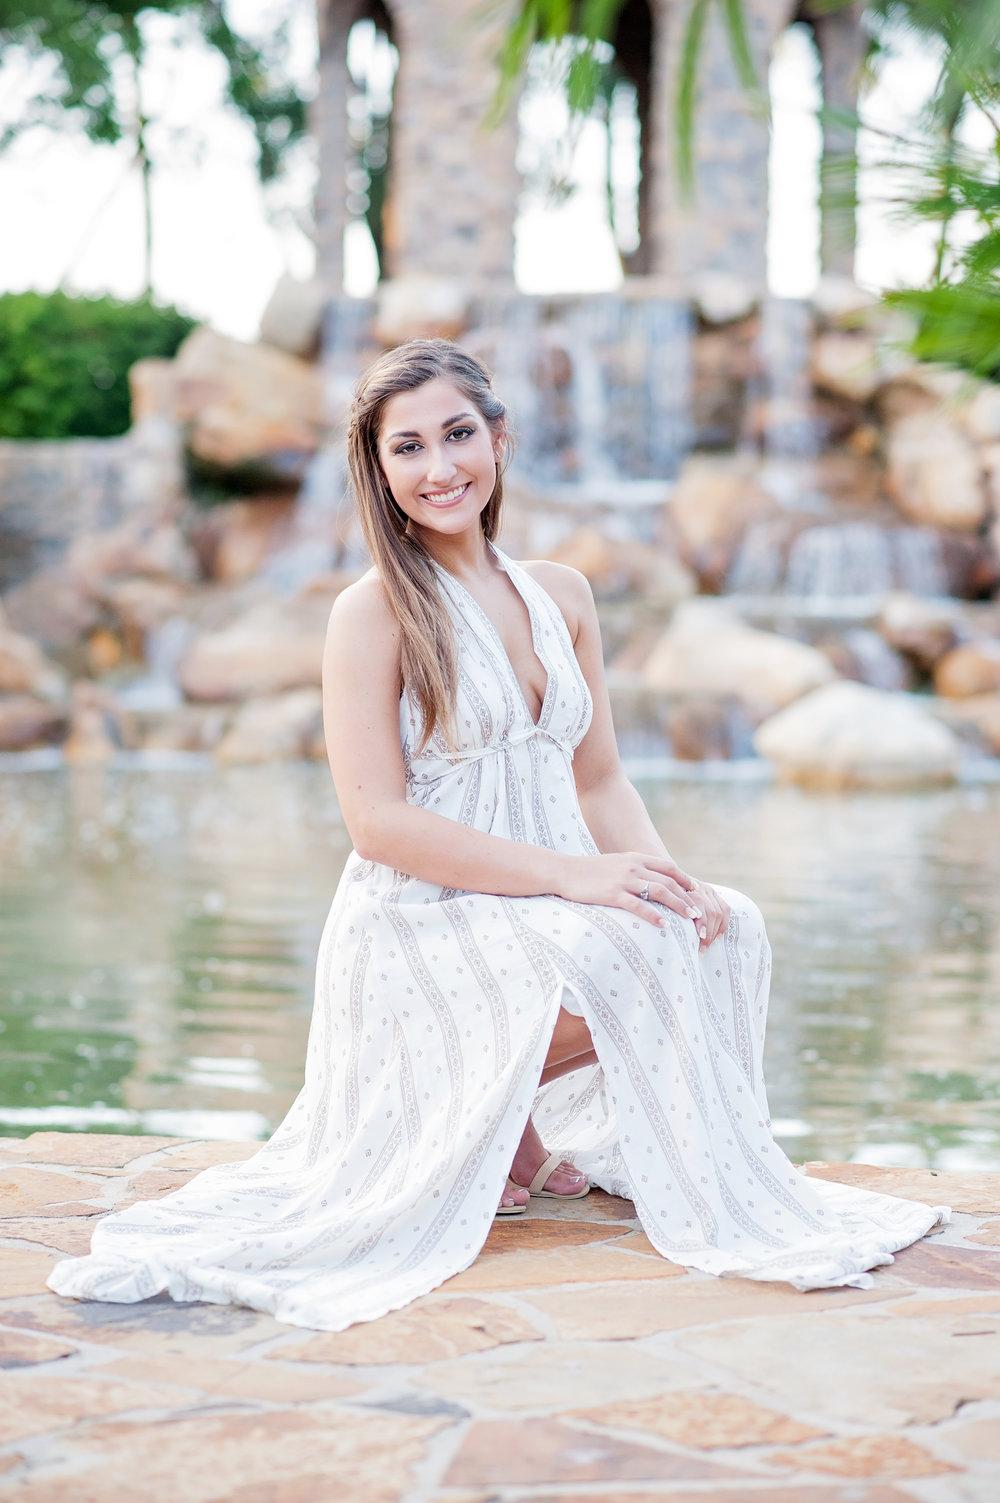 South Florida-photography-professional photographer-photography website-local photographer-teens-high school senior-photos-portrait photographer-119.jpg